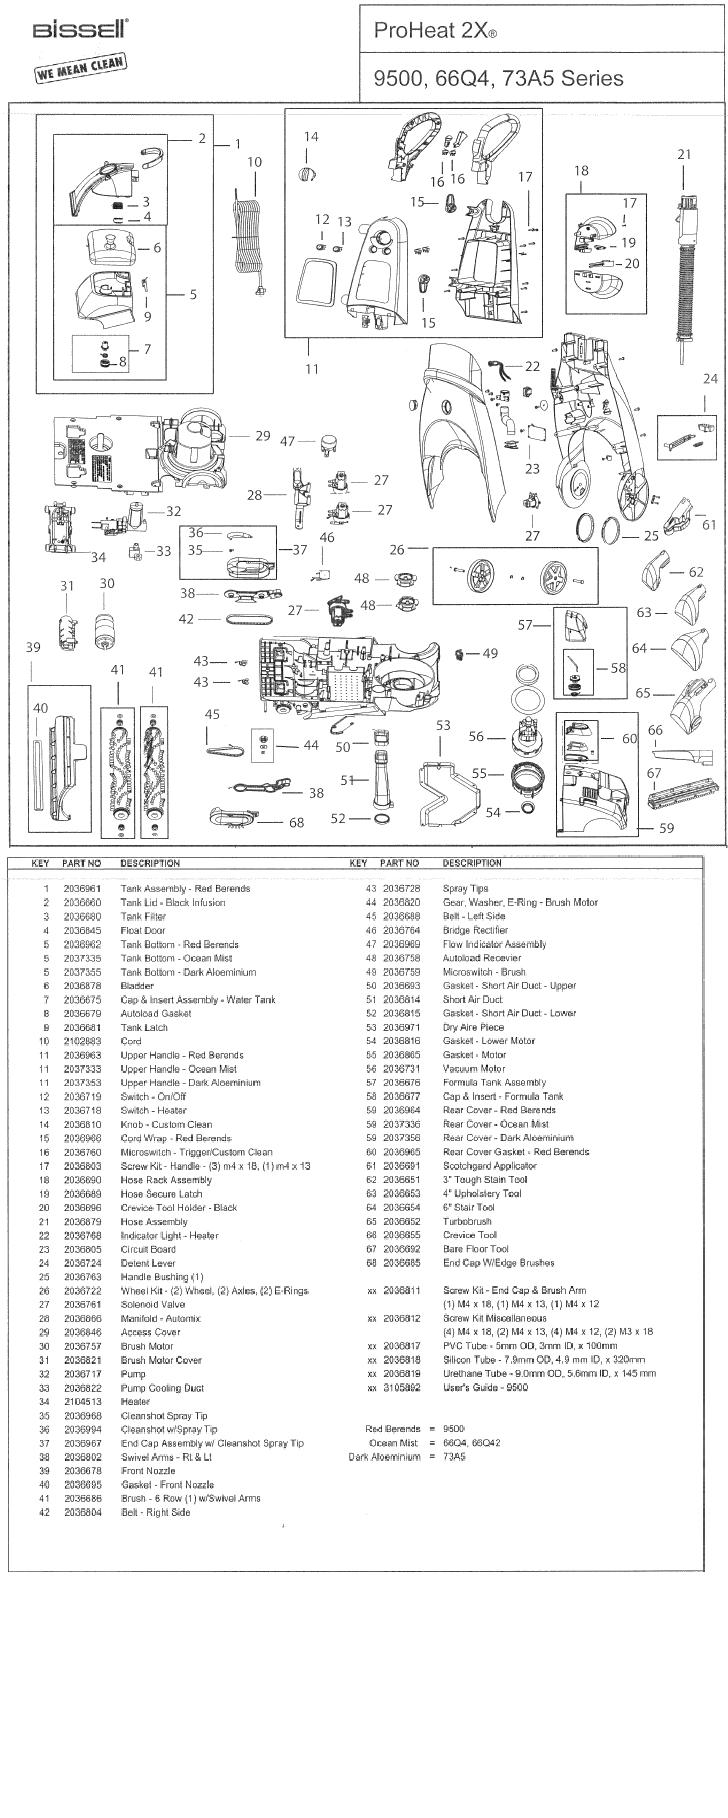 light wiring diagram for 8920